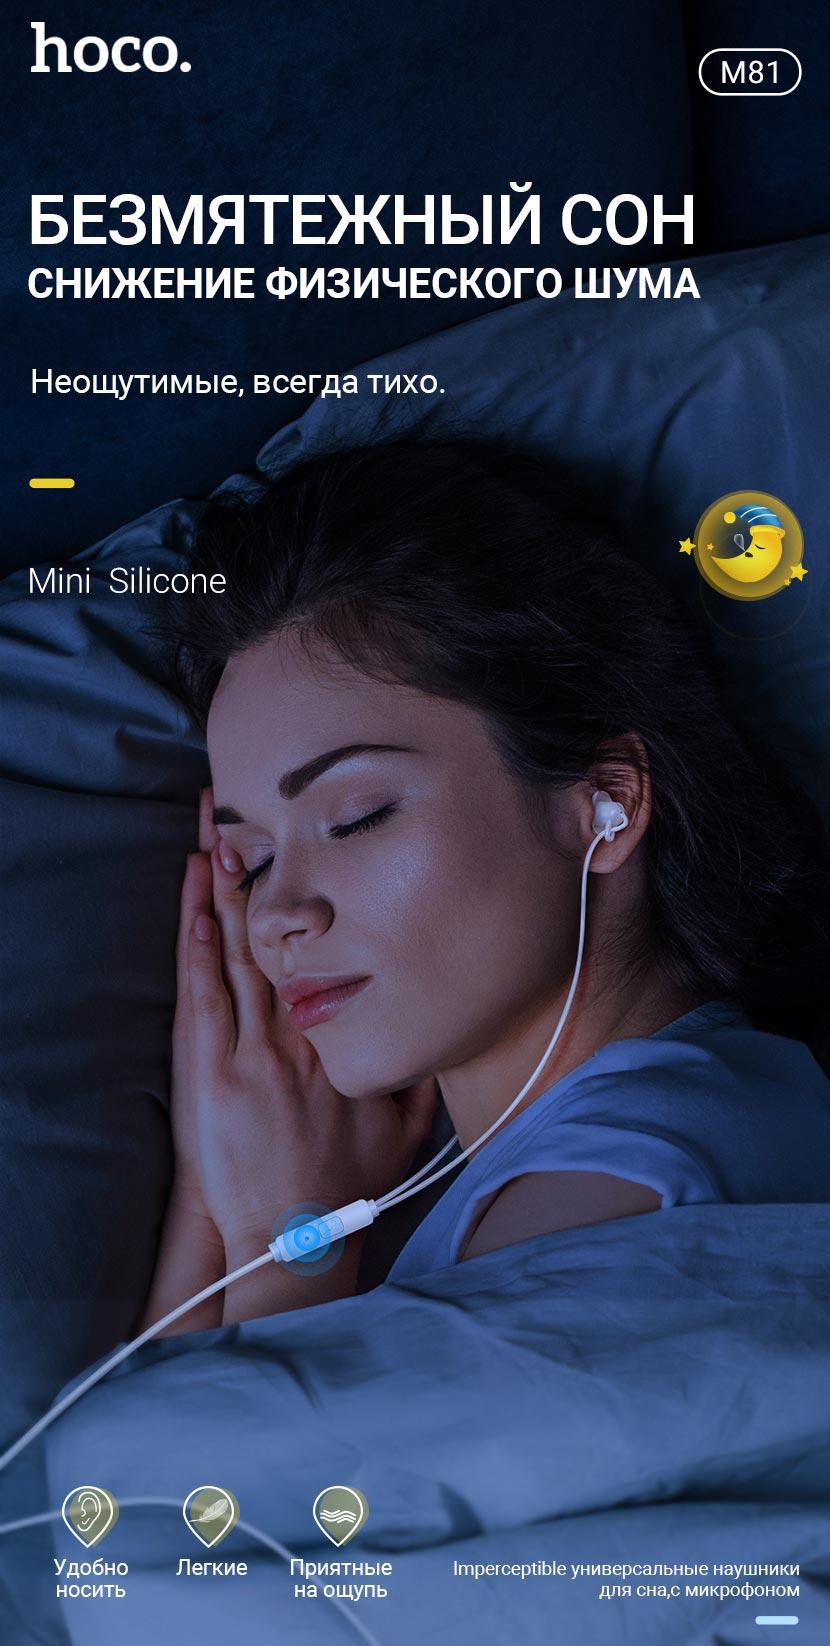 hoco news m81 imperceptible sleeping earphones with mic ru